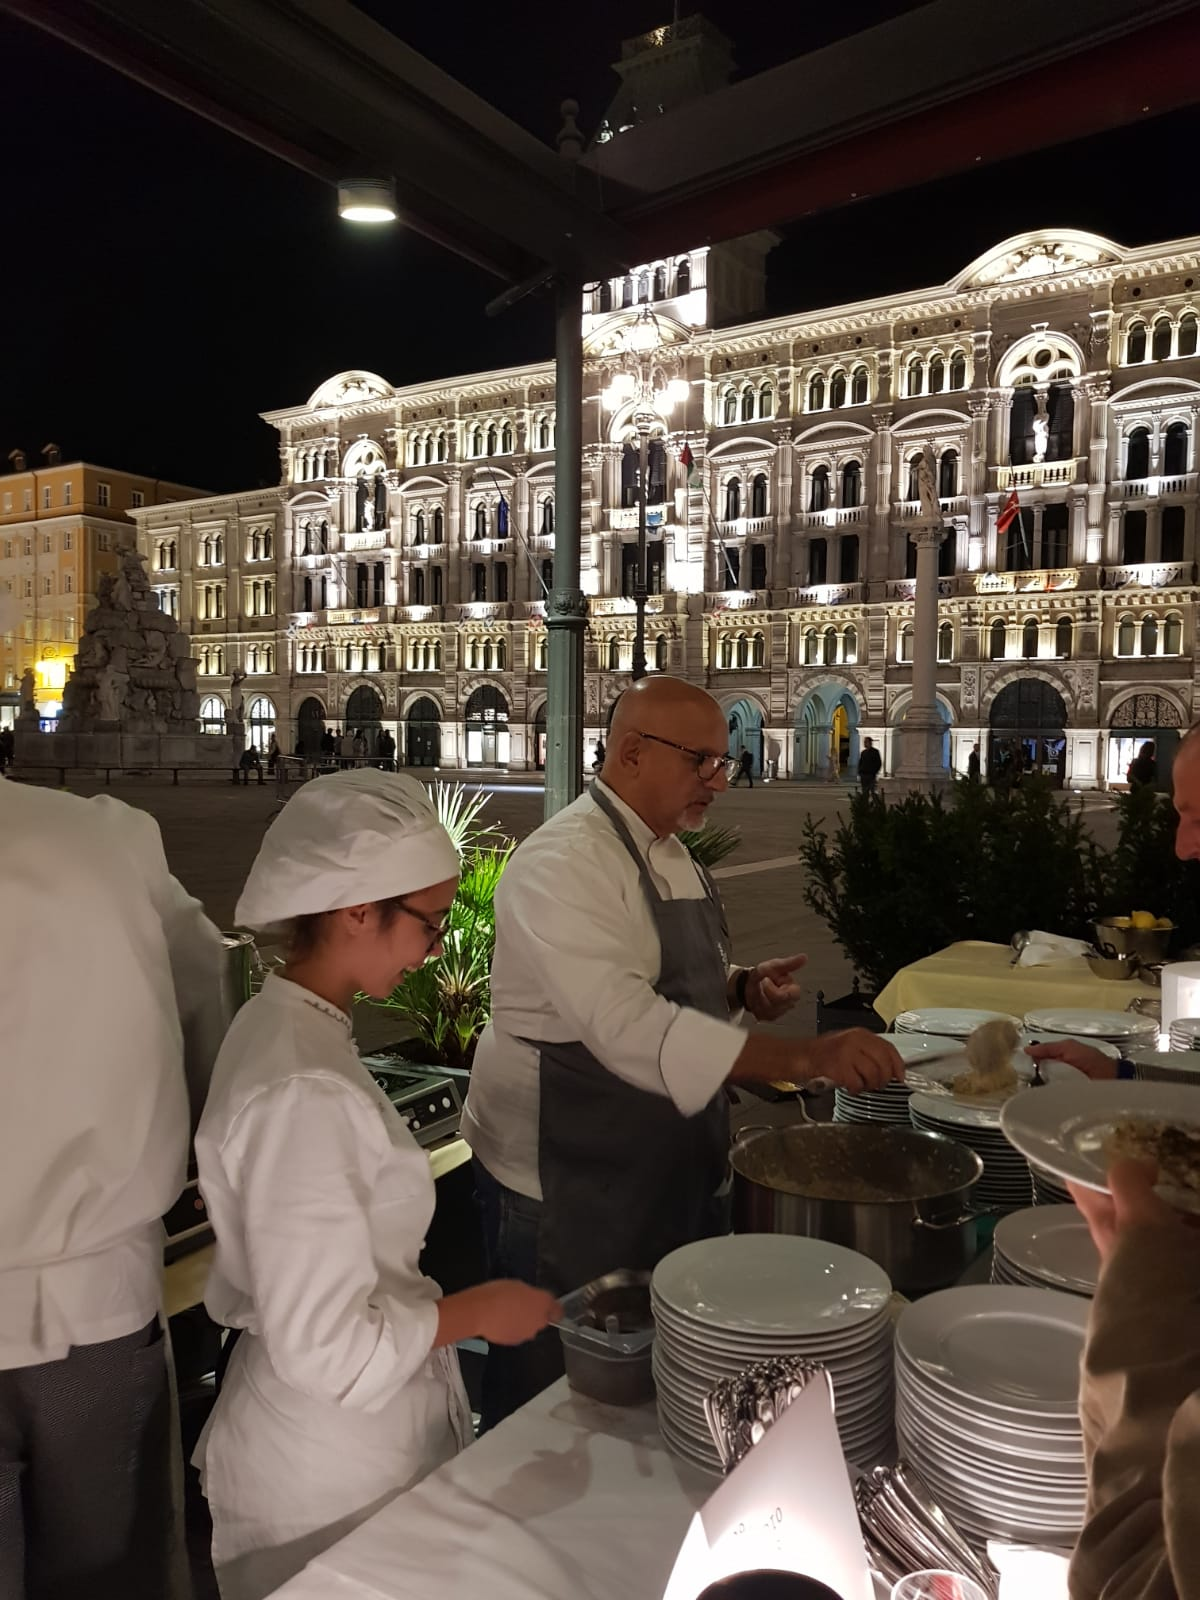 Barcolana chef Claudio Sadler